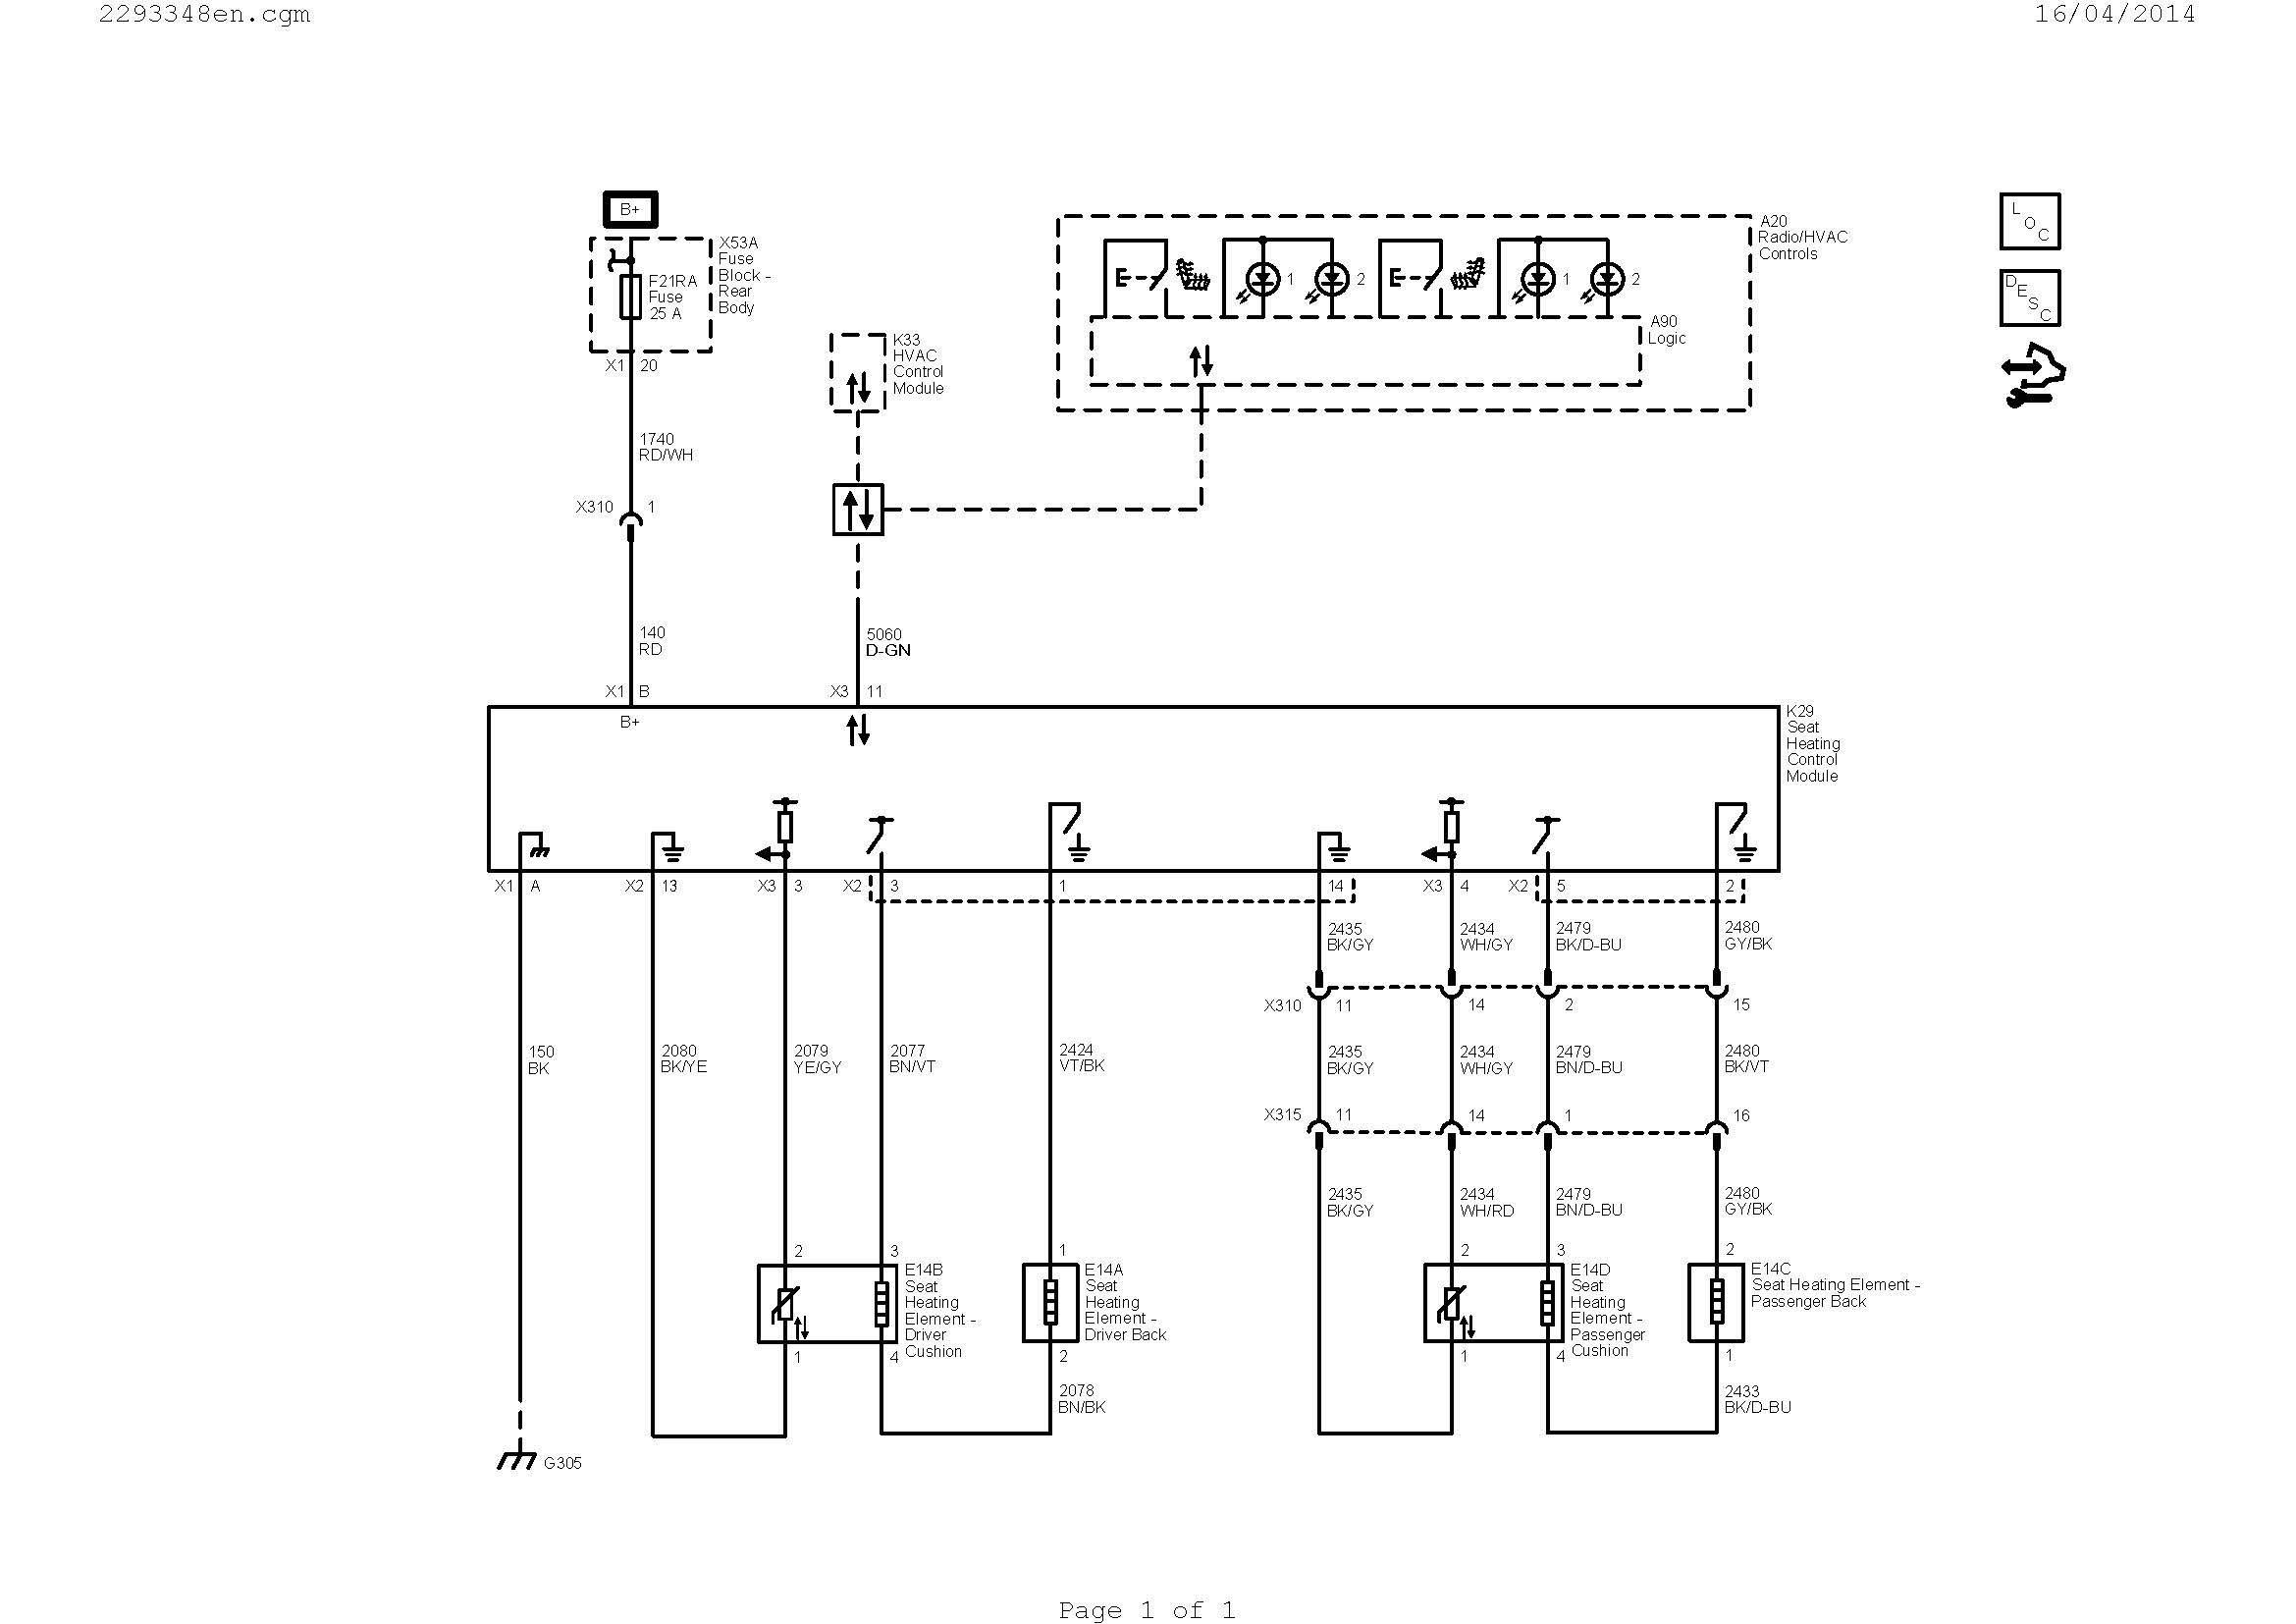 homeline load center wiring diagram 2006 sebring fuse box square d free